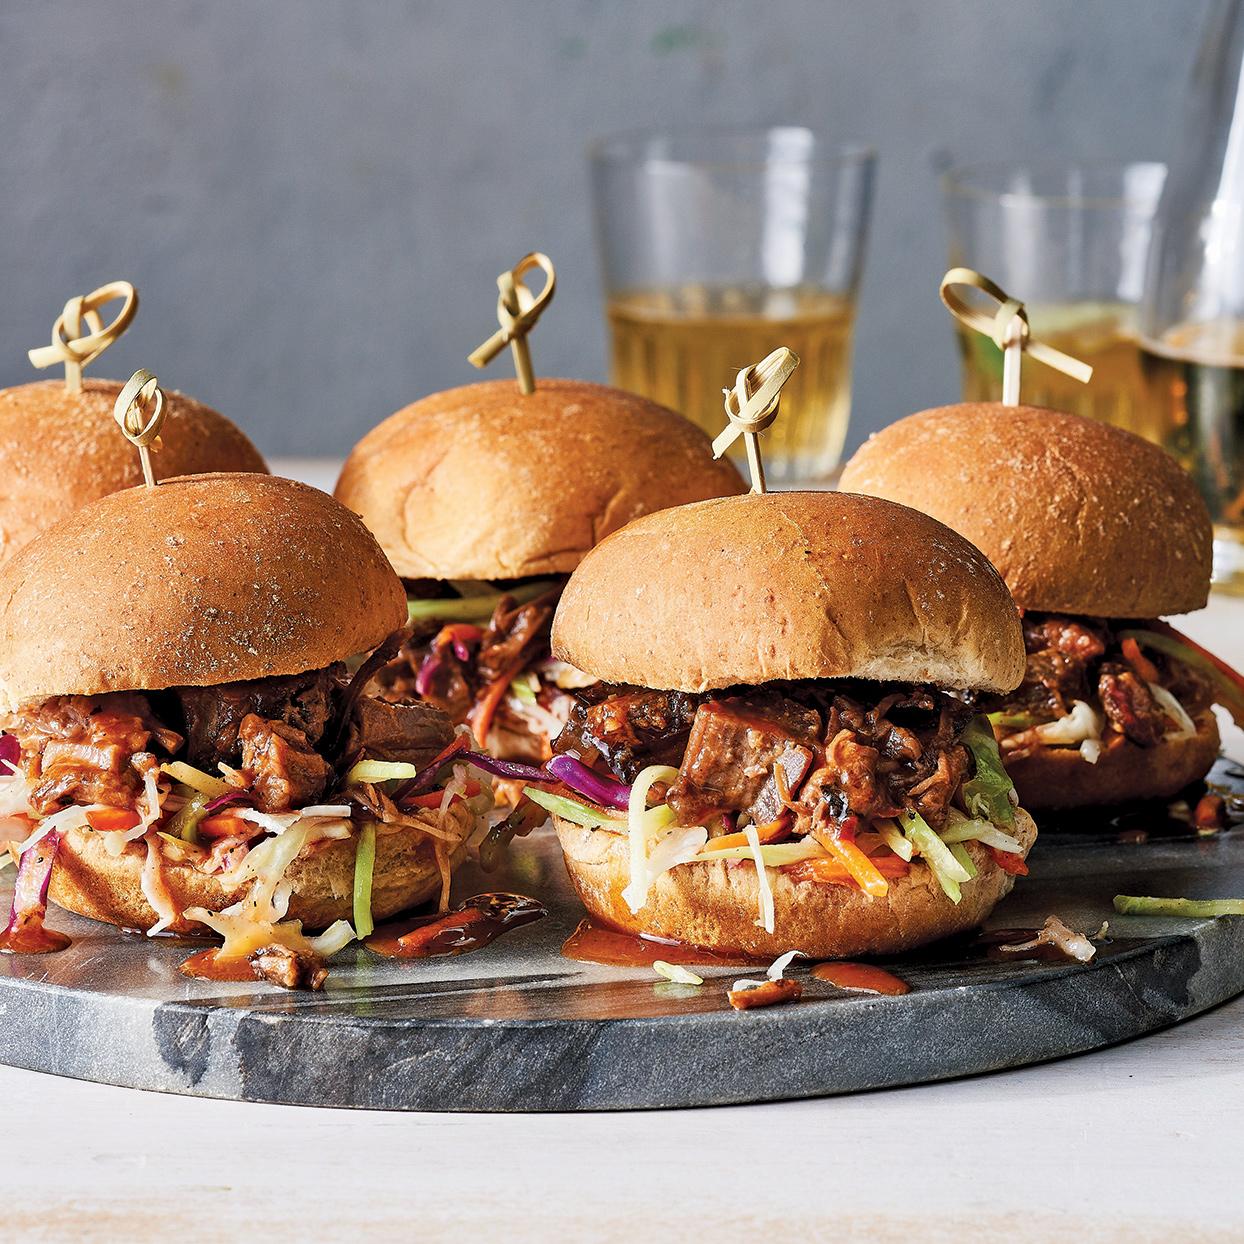 Healthy Super Bowl Dinner Recipes